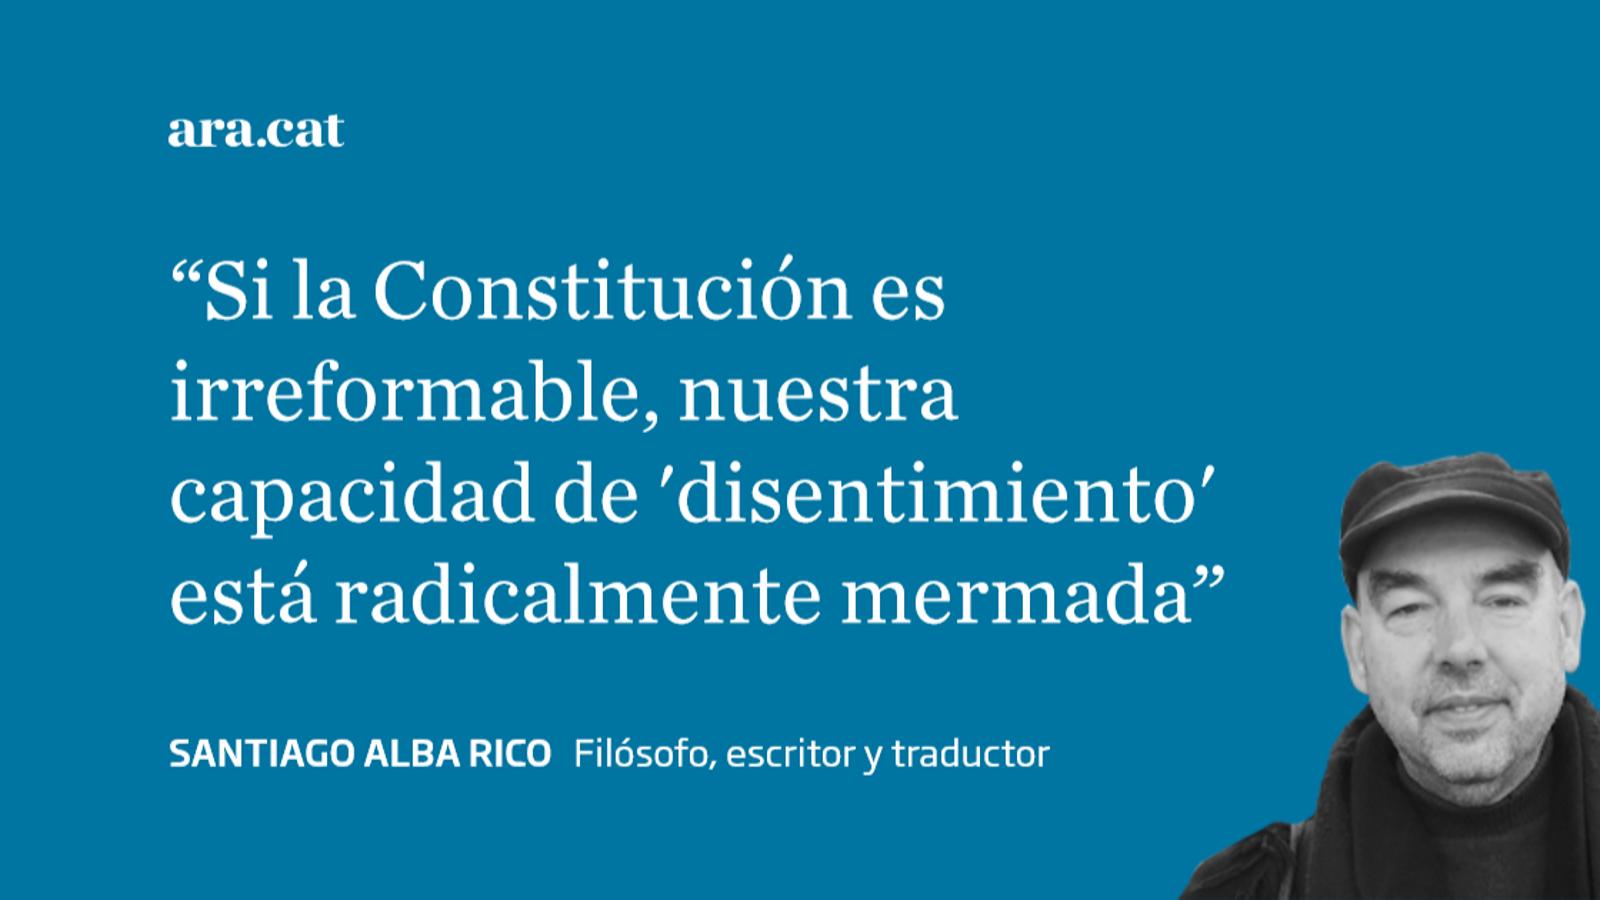 Constitucionalismo y casticismo